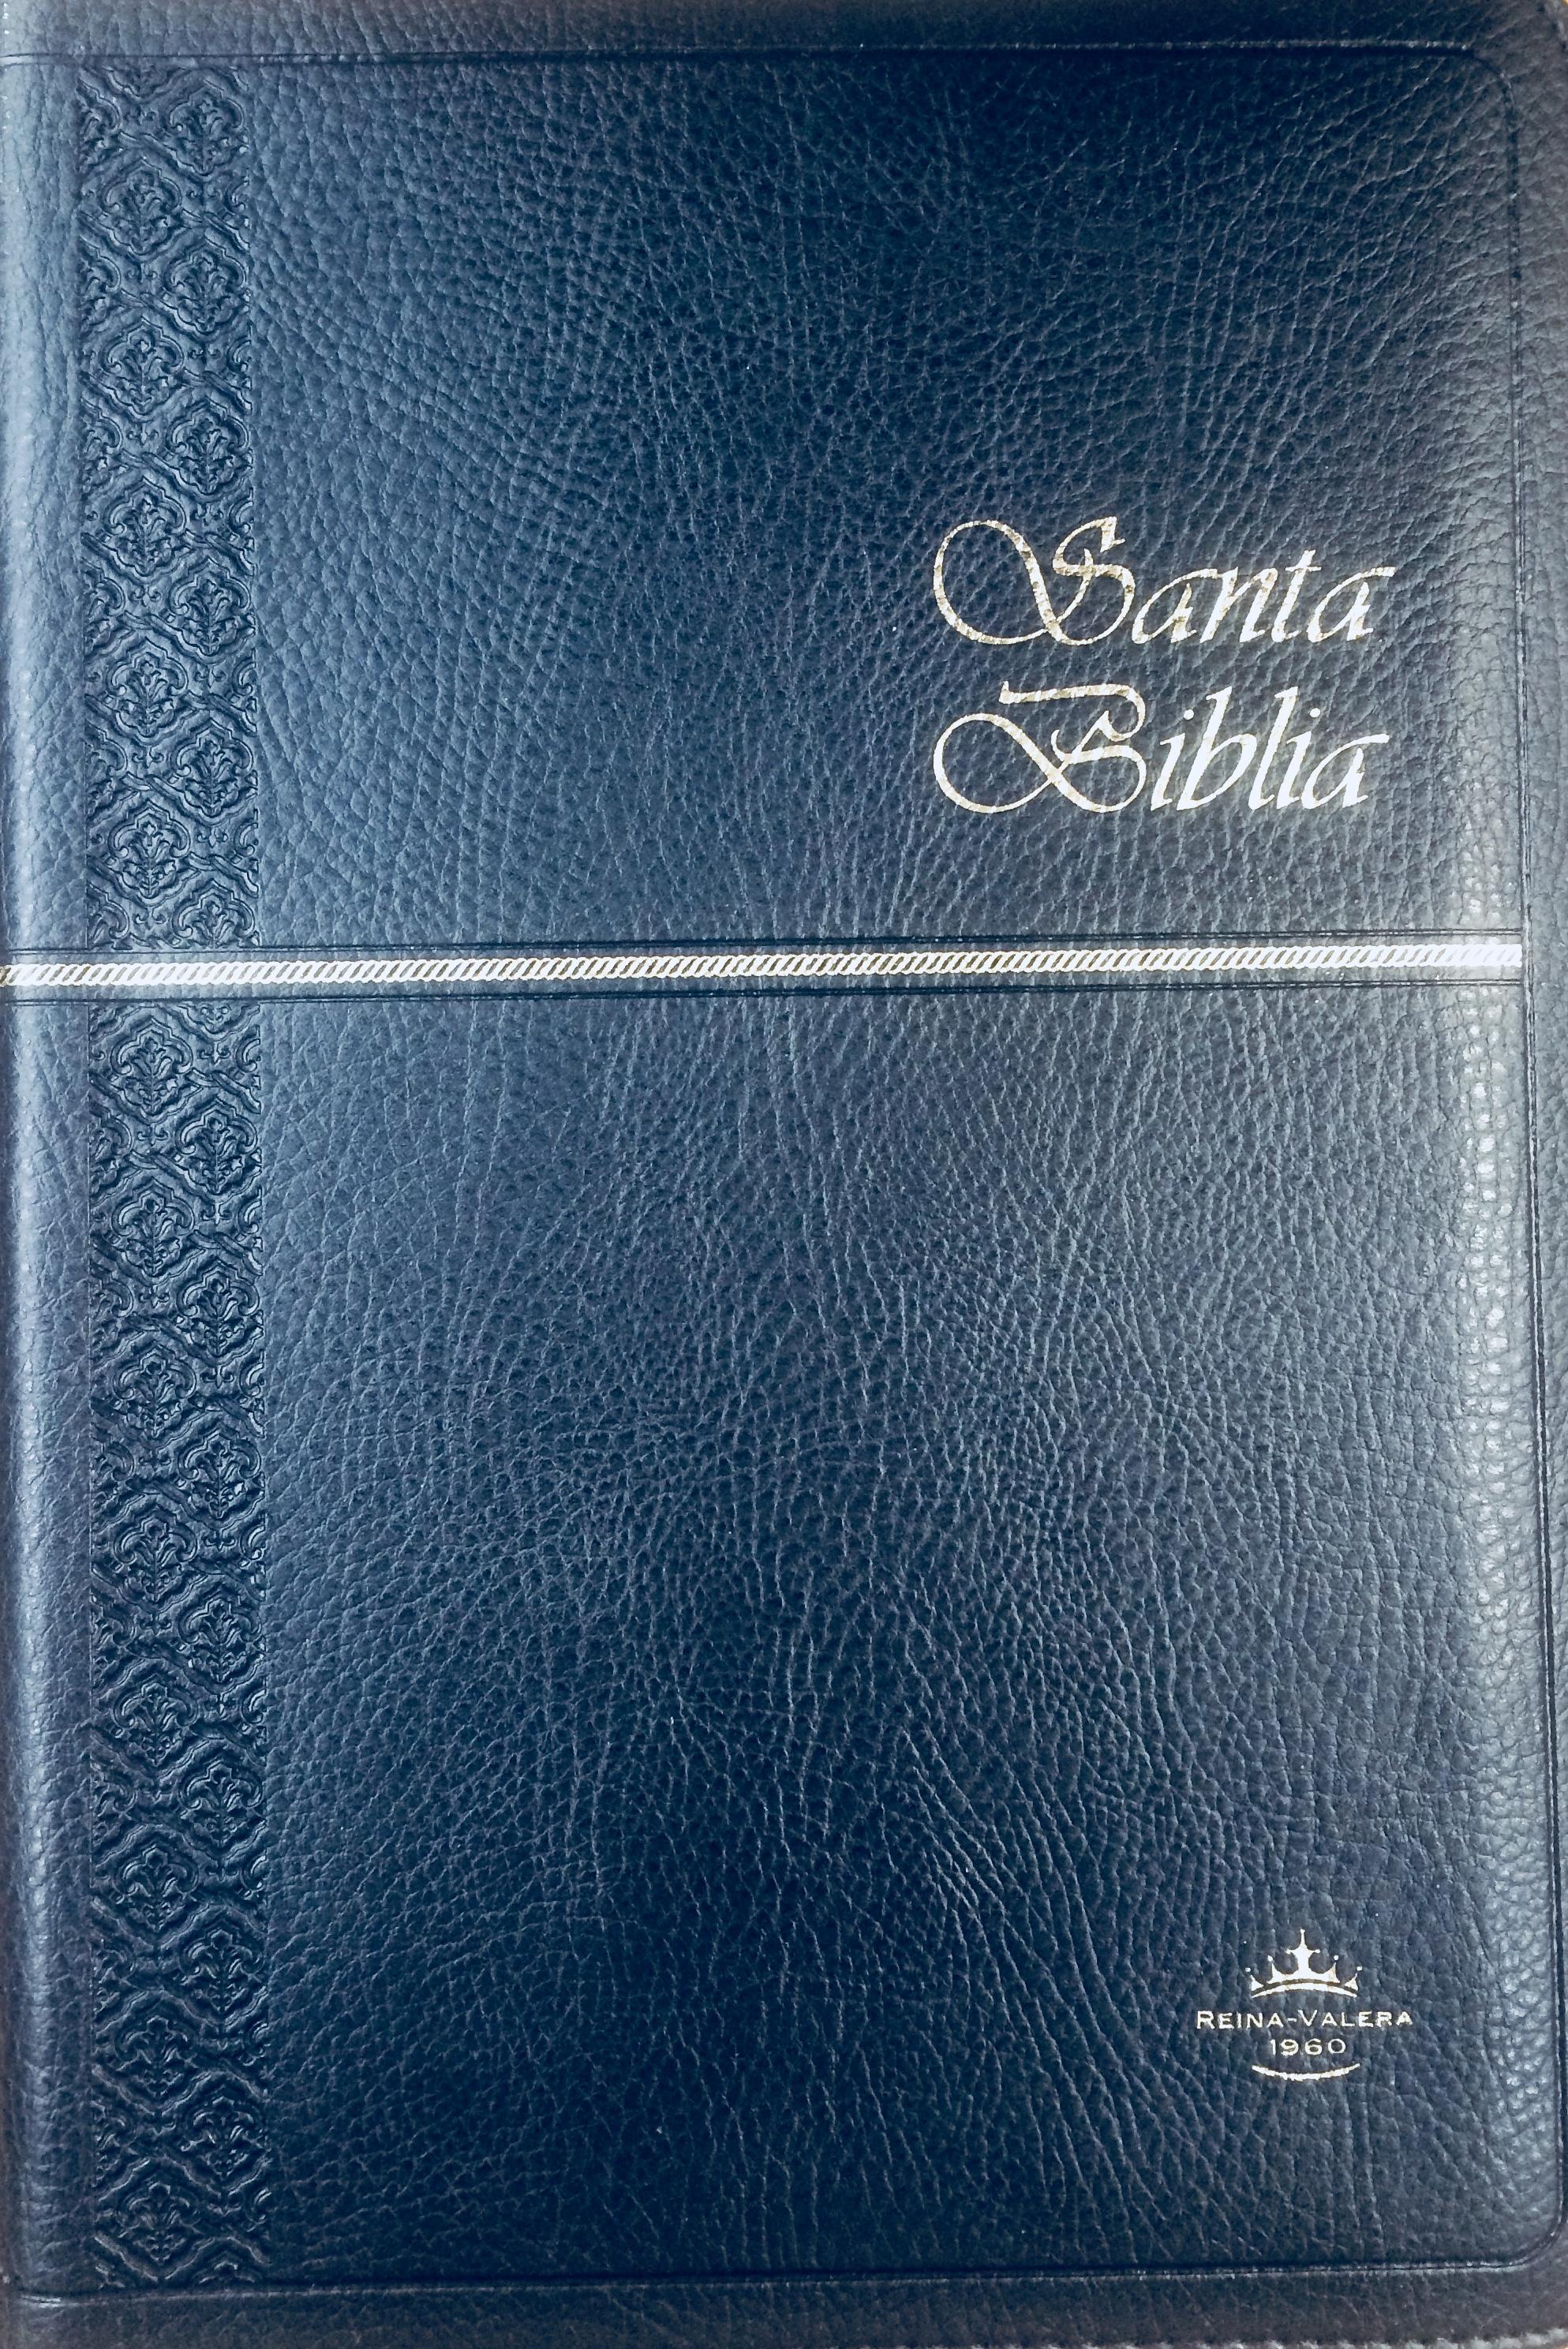 Biblia RVR60 Semifina Cierre Indice Azul Oscuro